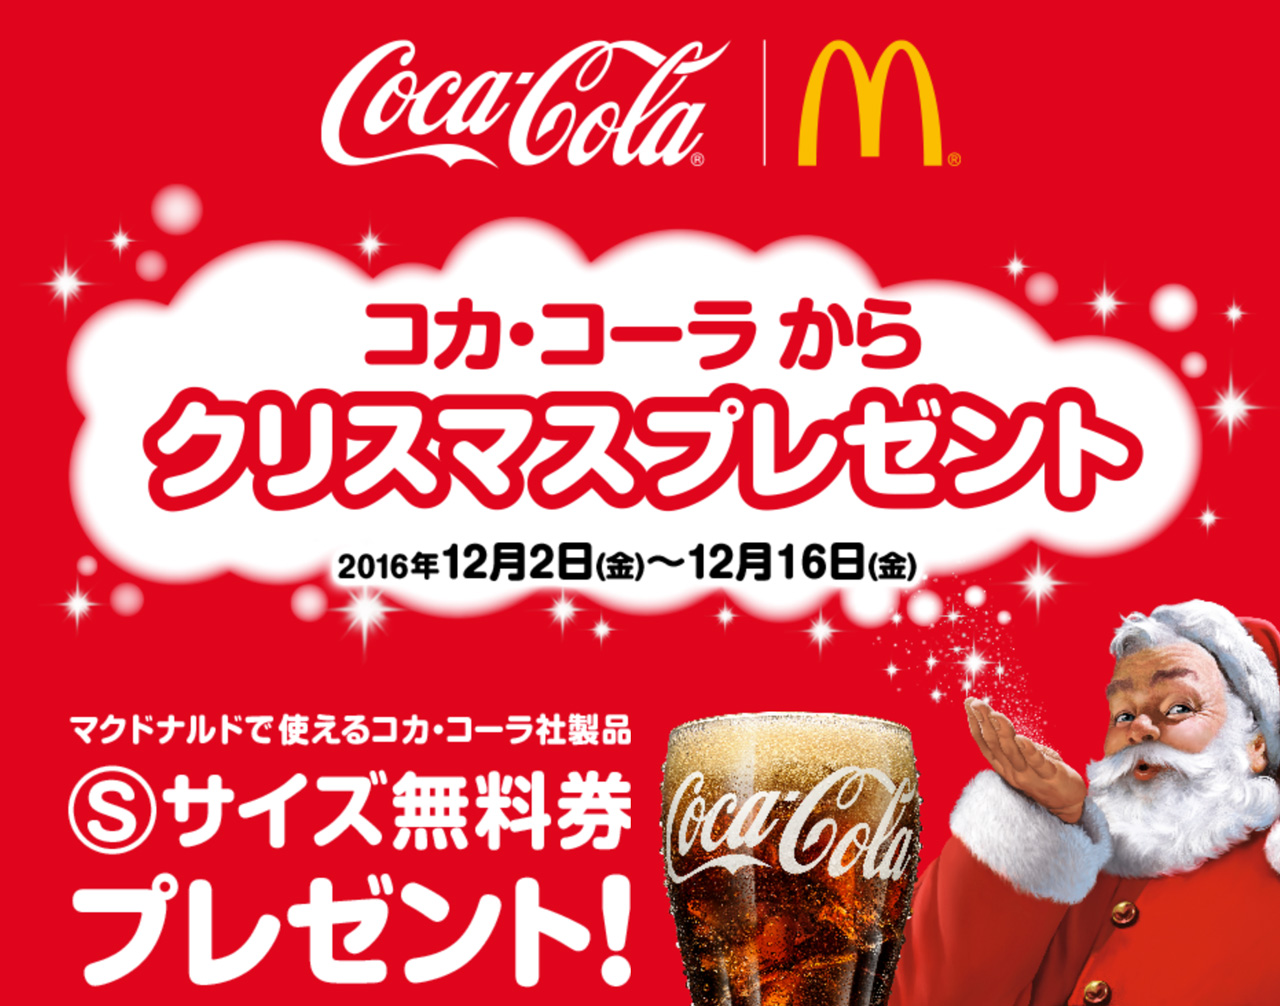 mcdonalds-campaign-coupon-christmas-top